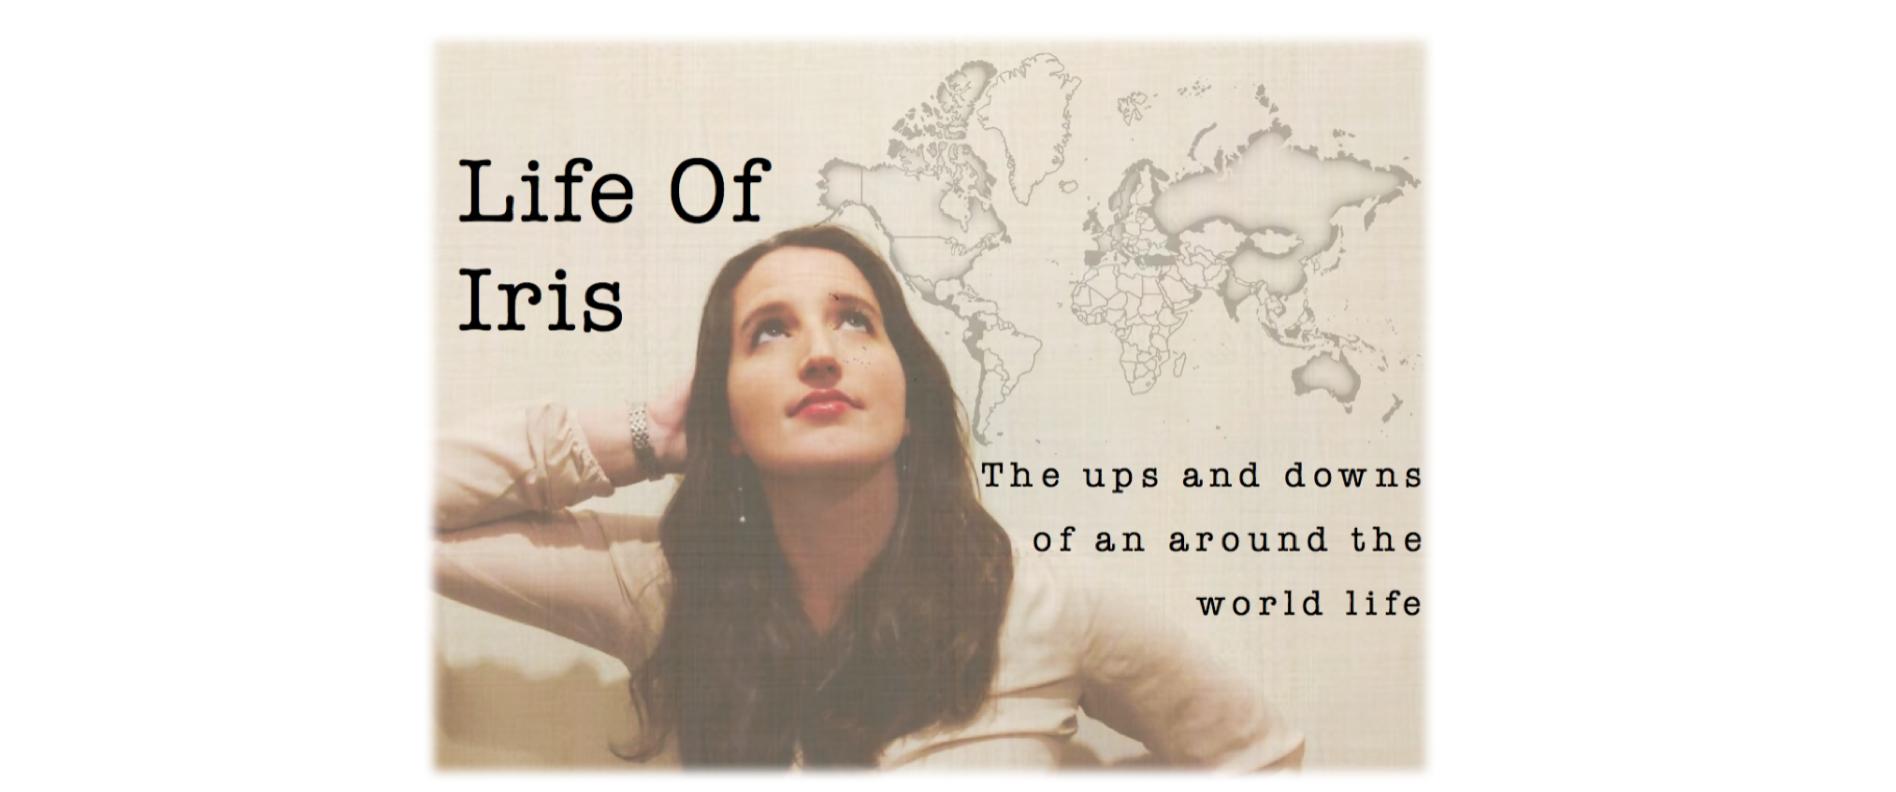 Life Of Iris